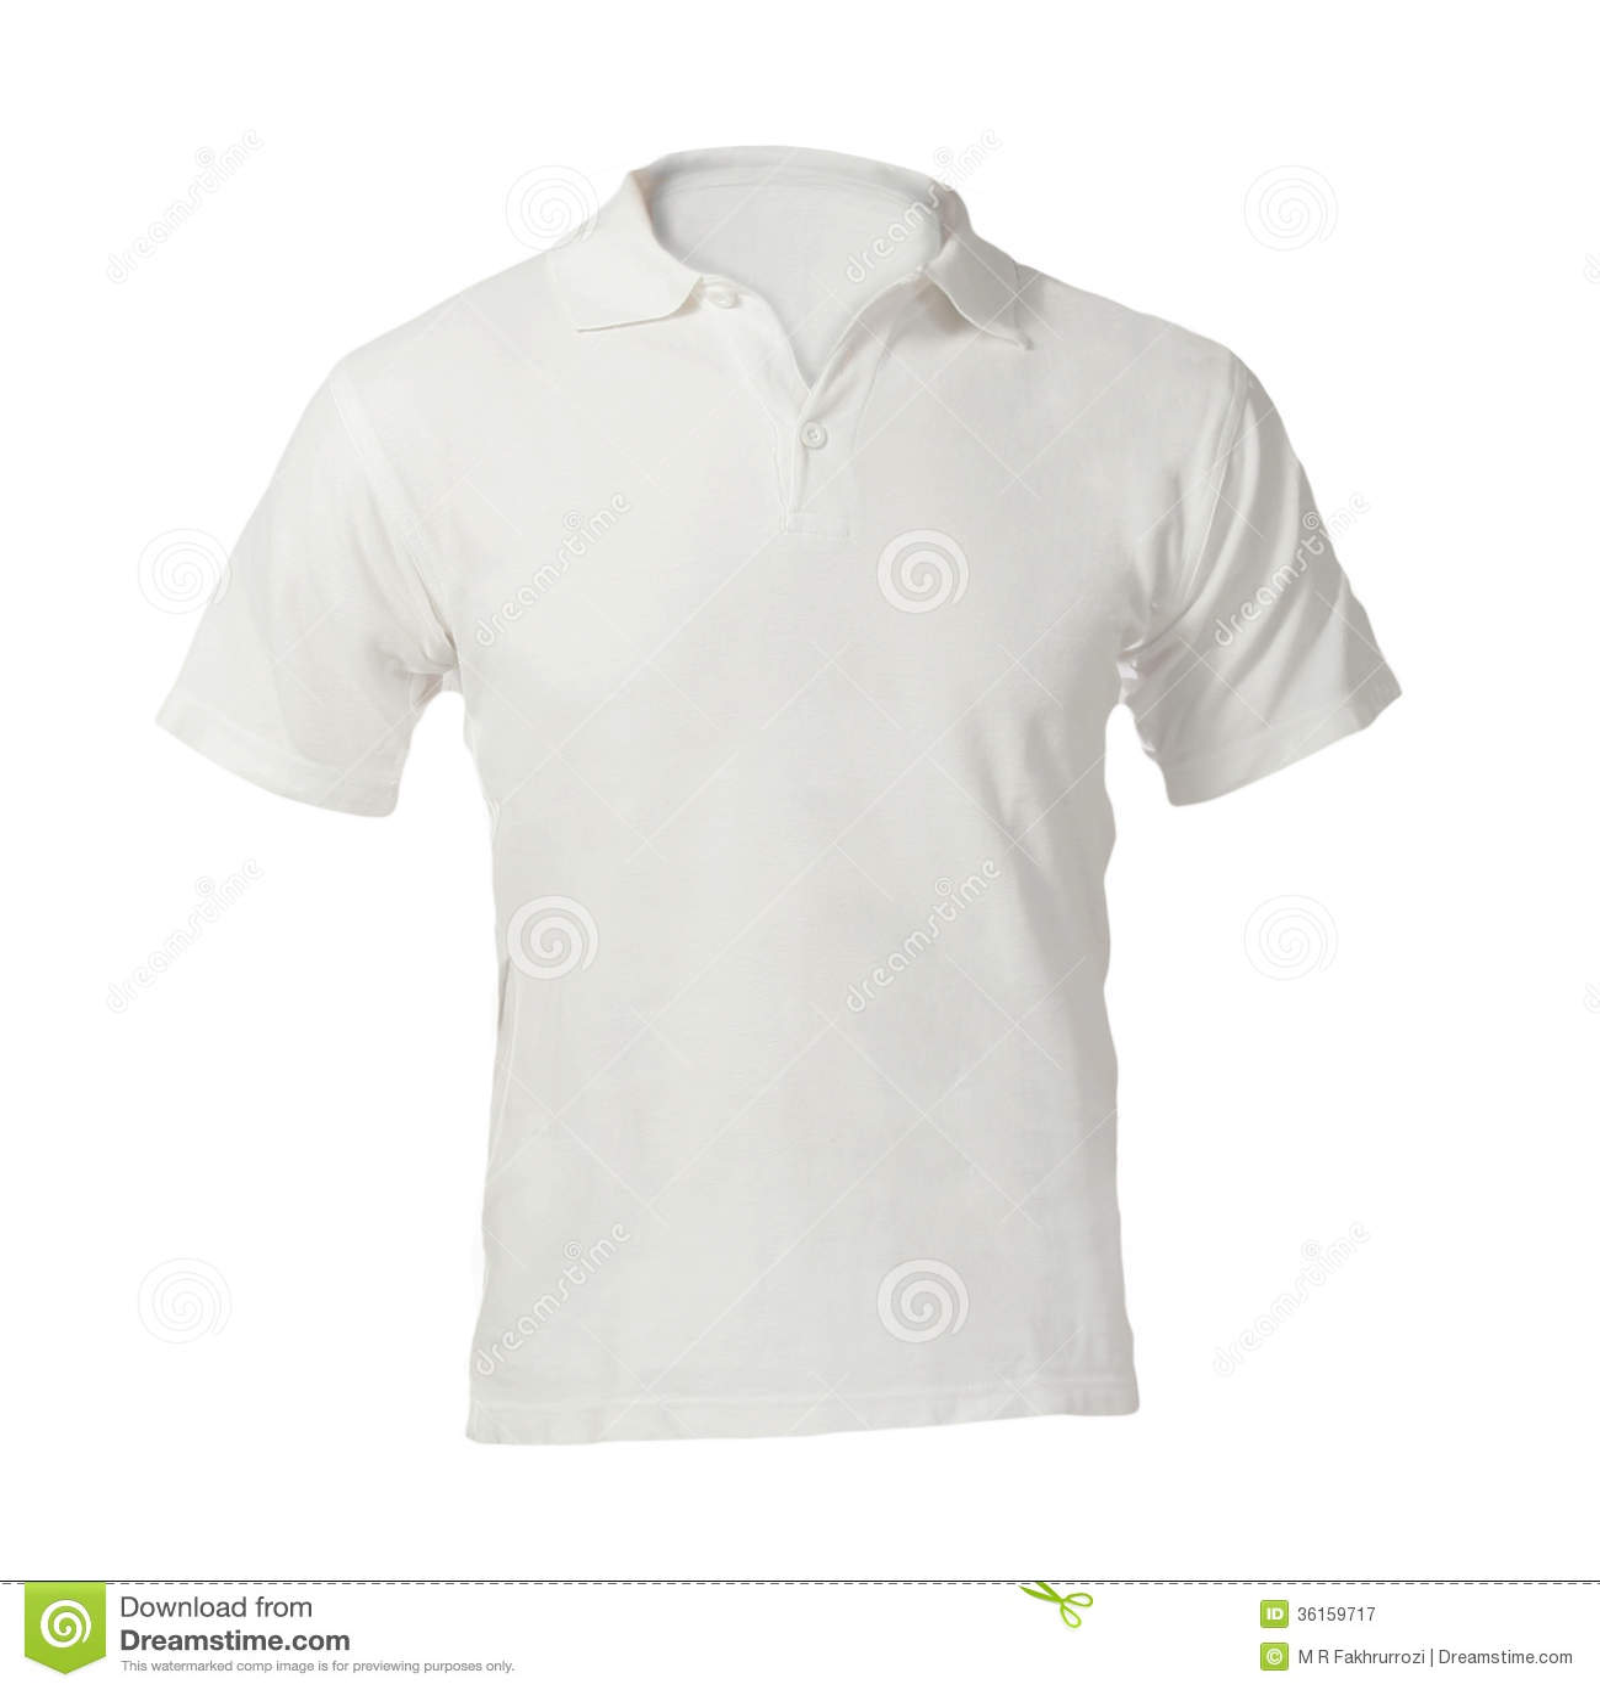 0d6e1731 Men's Blank White Polo Shirt Template Stock Image - Image of tshirt ...